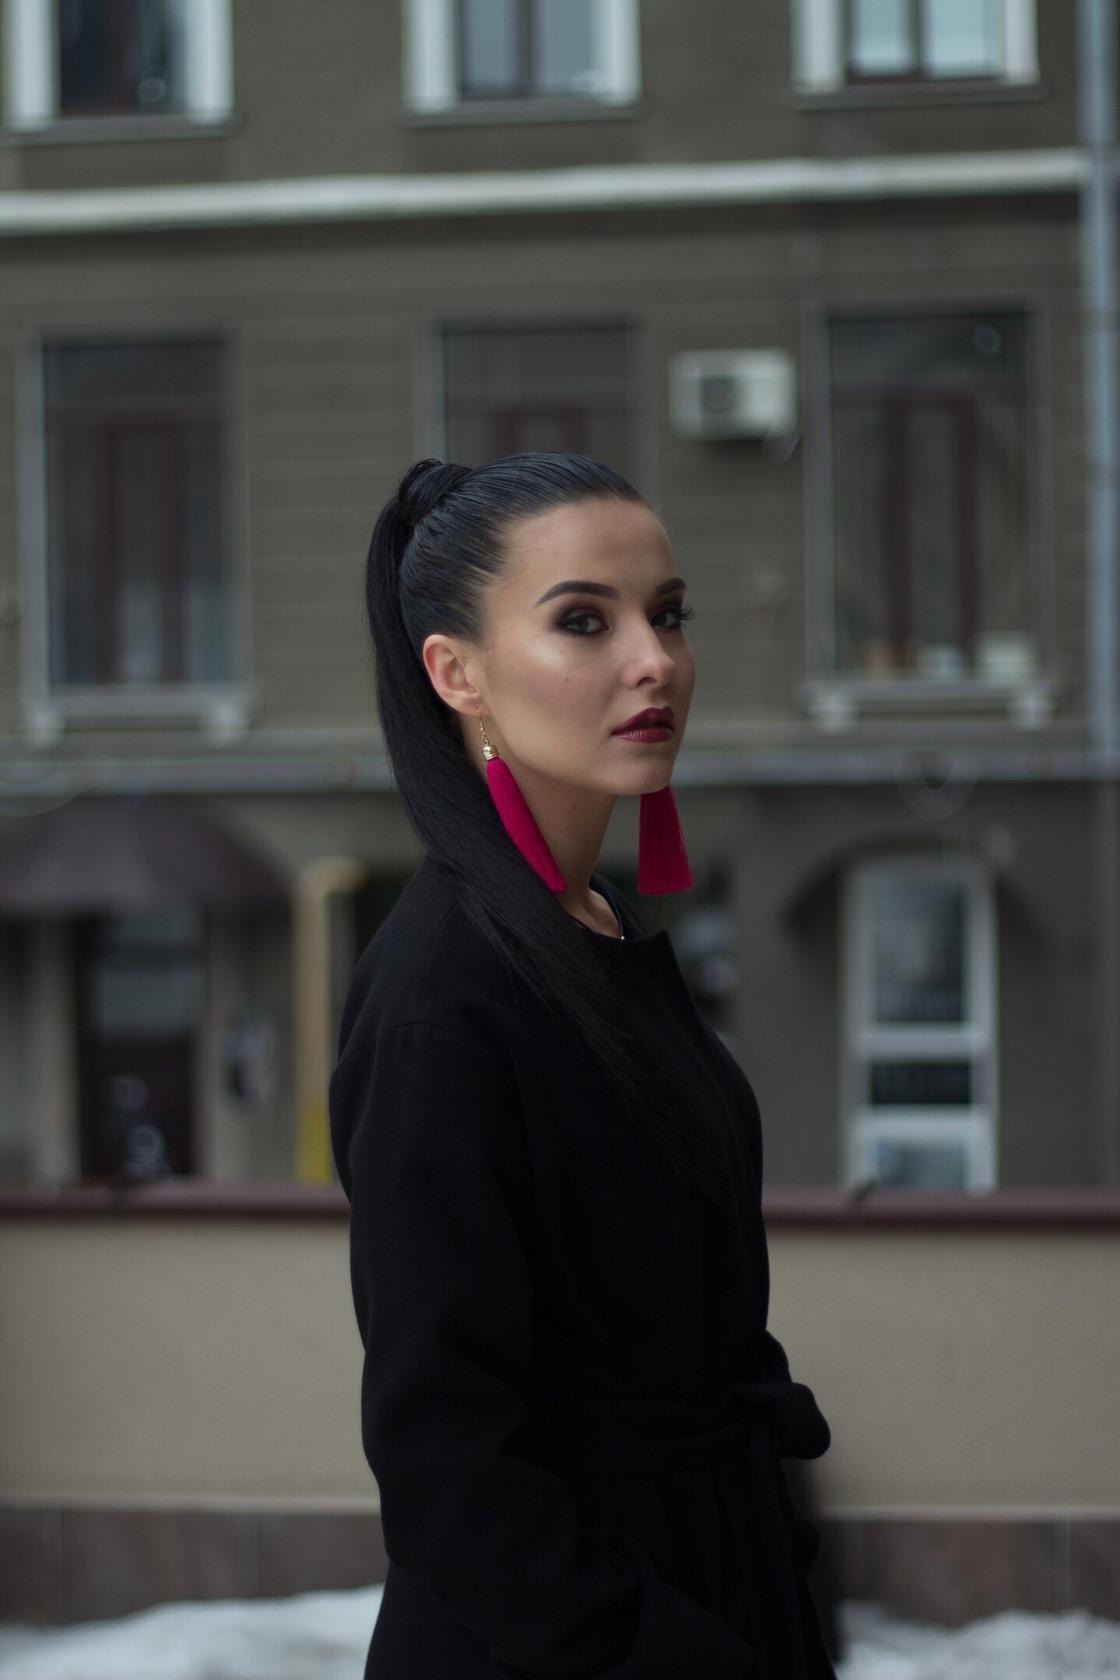 Bachelor Ukraine - Season 9 - Nikita Dobrynin - Contestants - *Sleuthing Spoilers* HeNdlqEQf0E